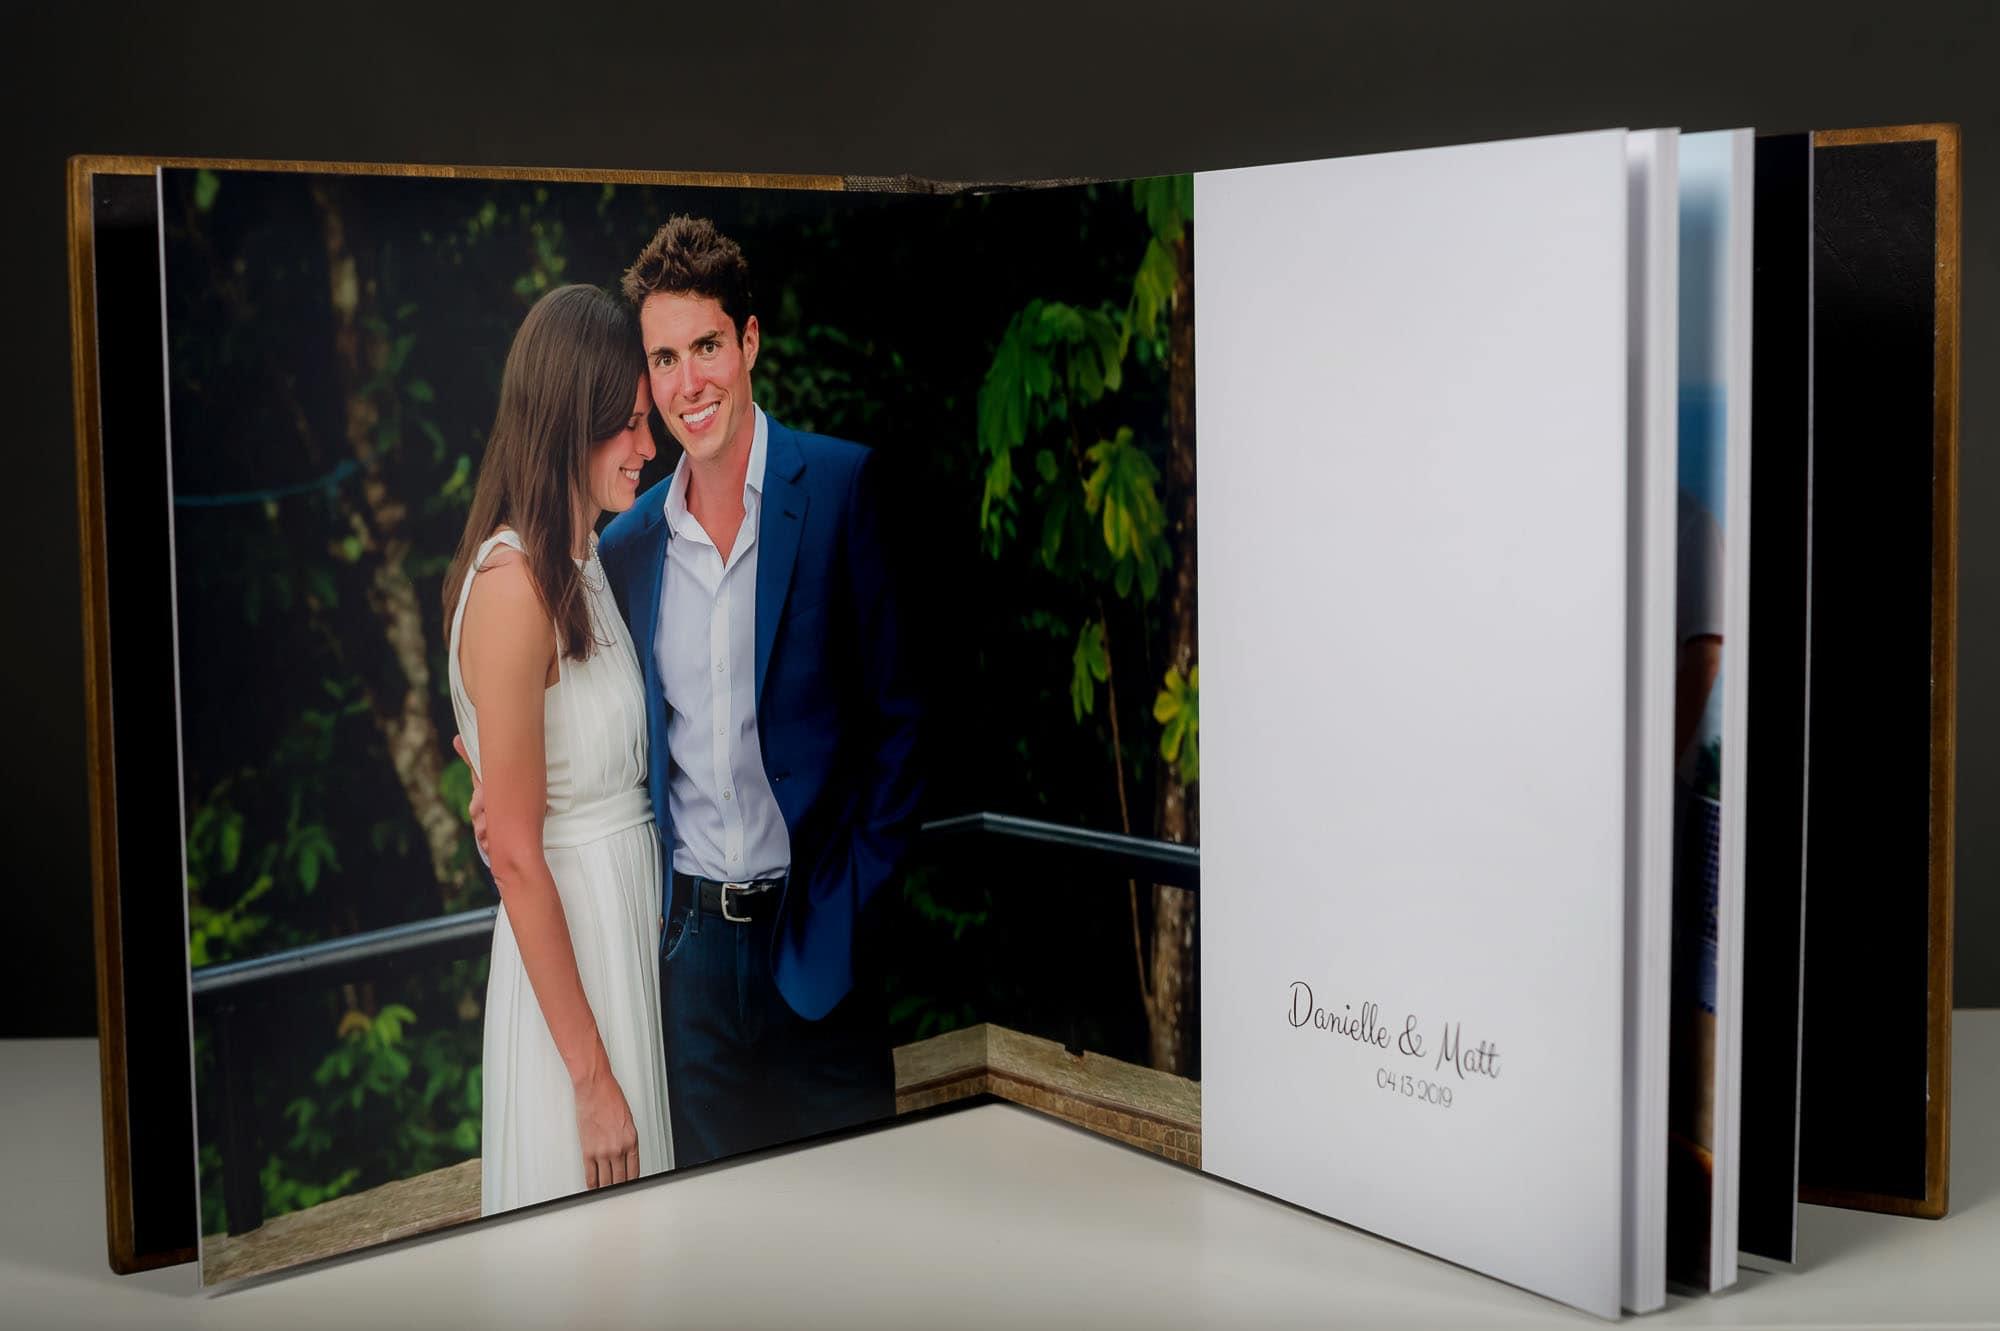 handcrafted wedding album